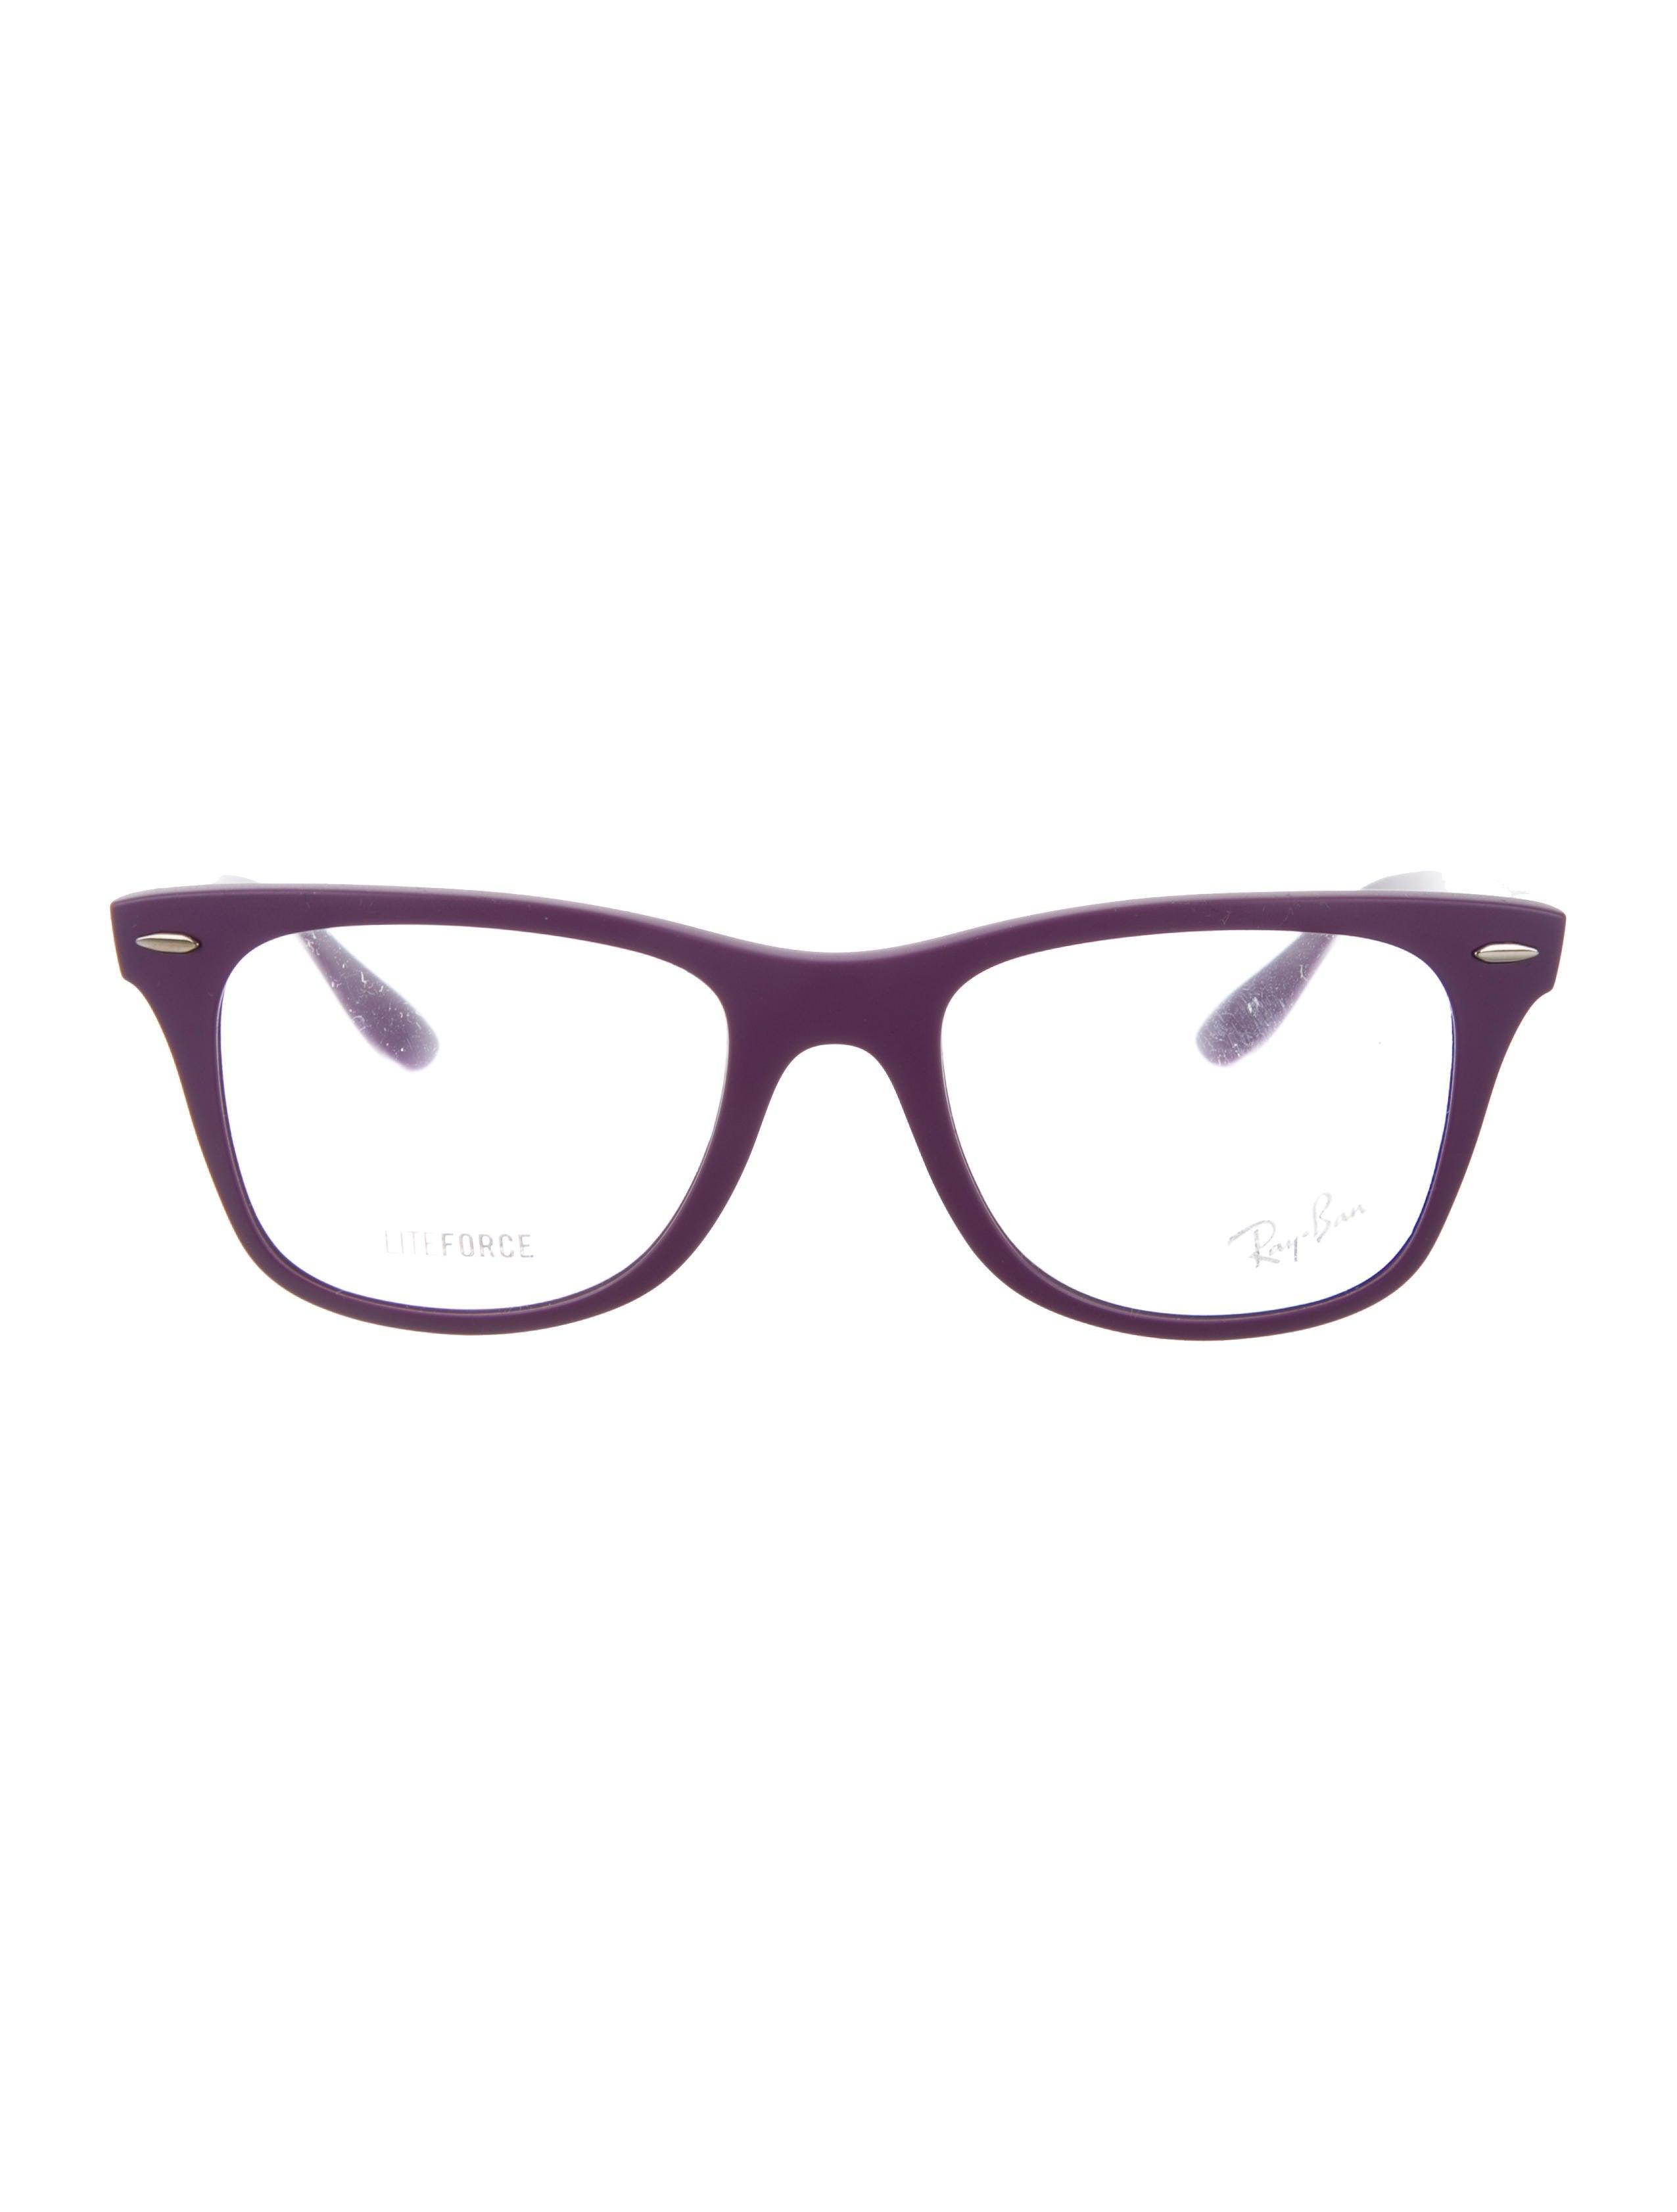 db6804144c82d Ray-Ban Square Liteforce Eyeglasses - Accessories - WRX32048